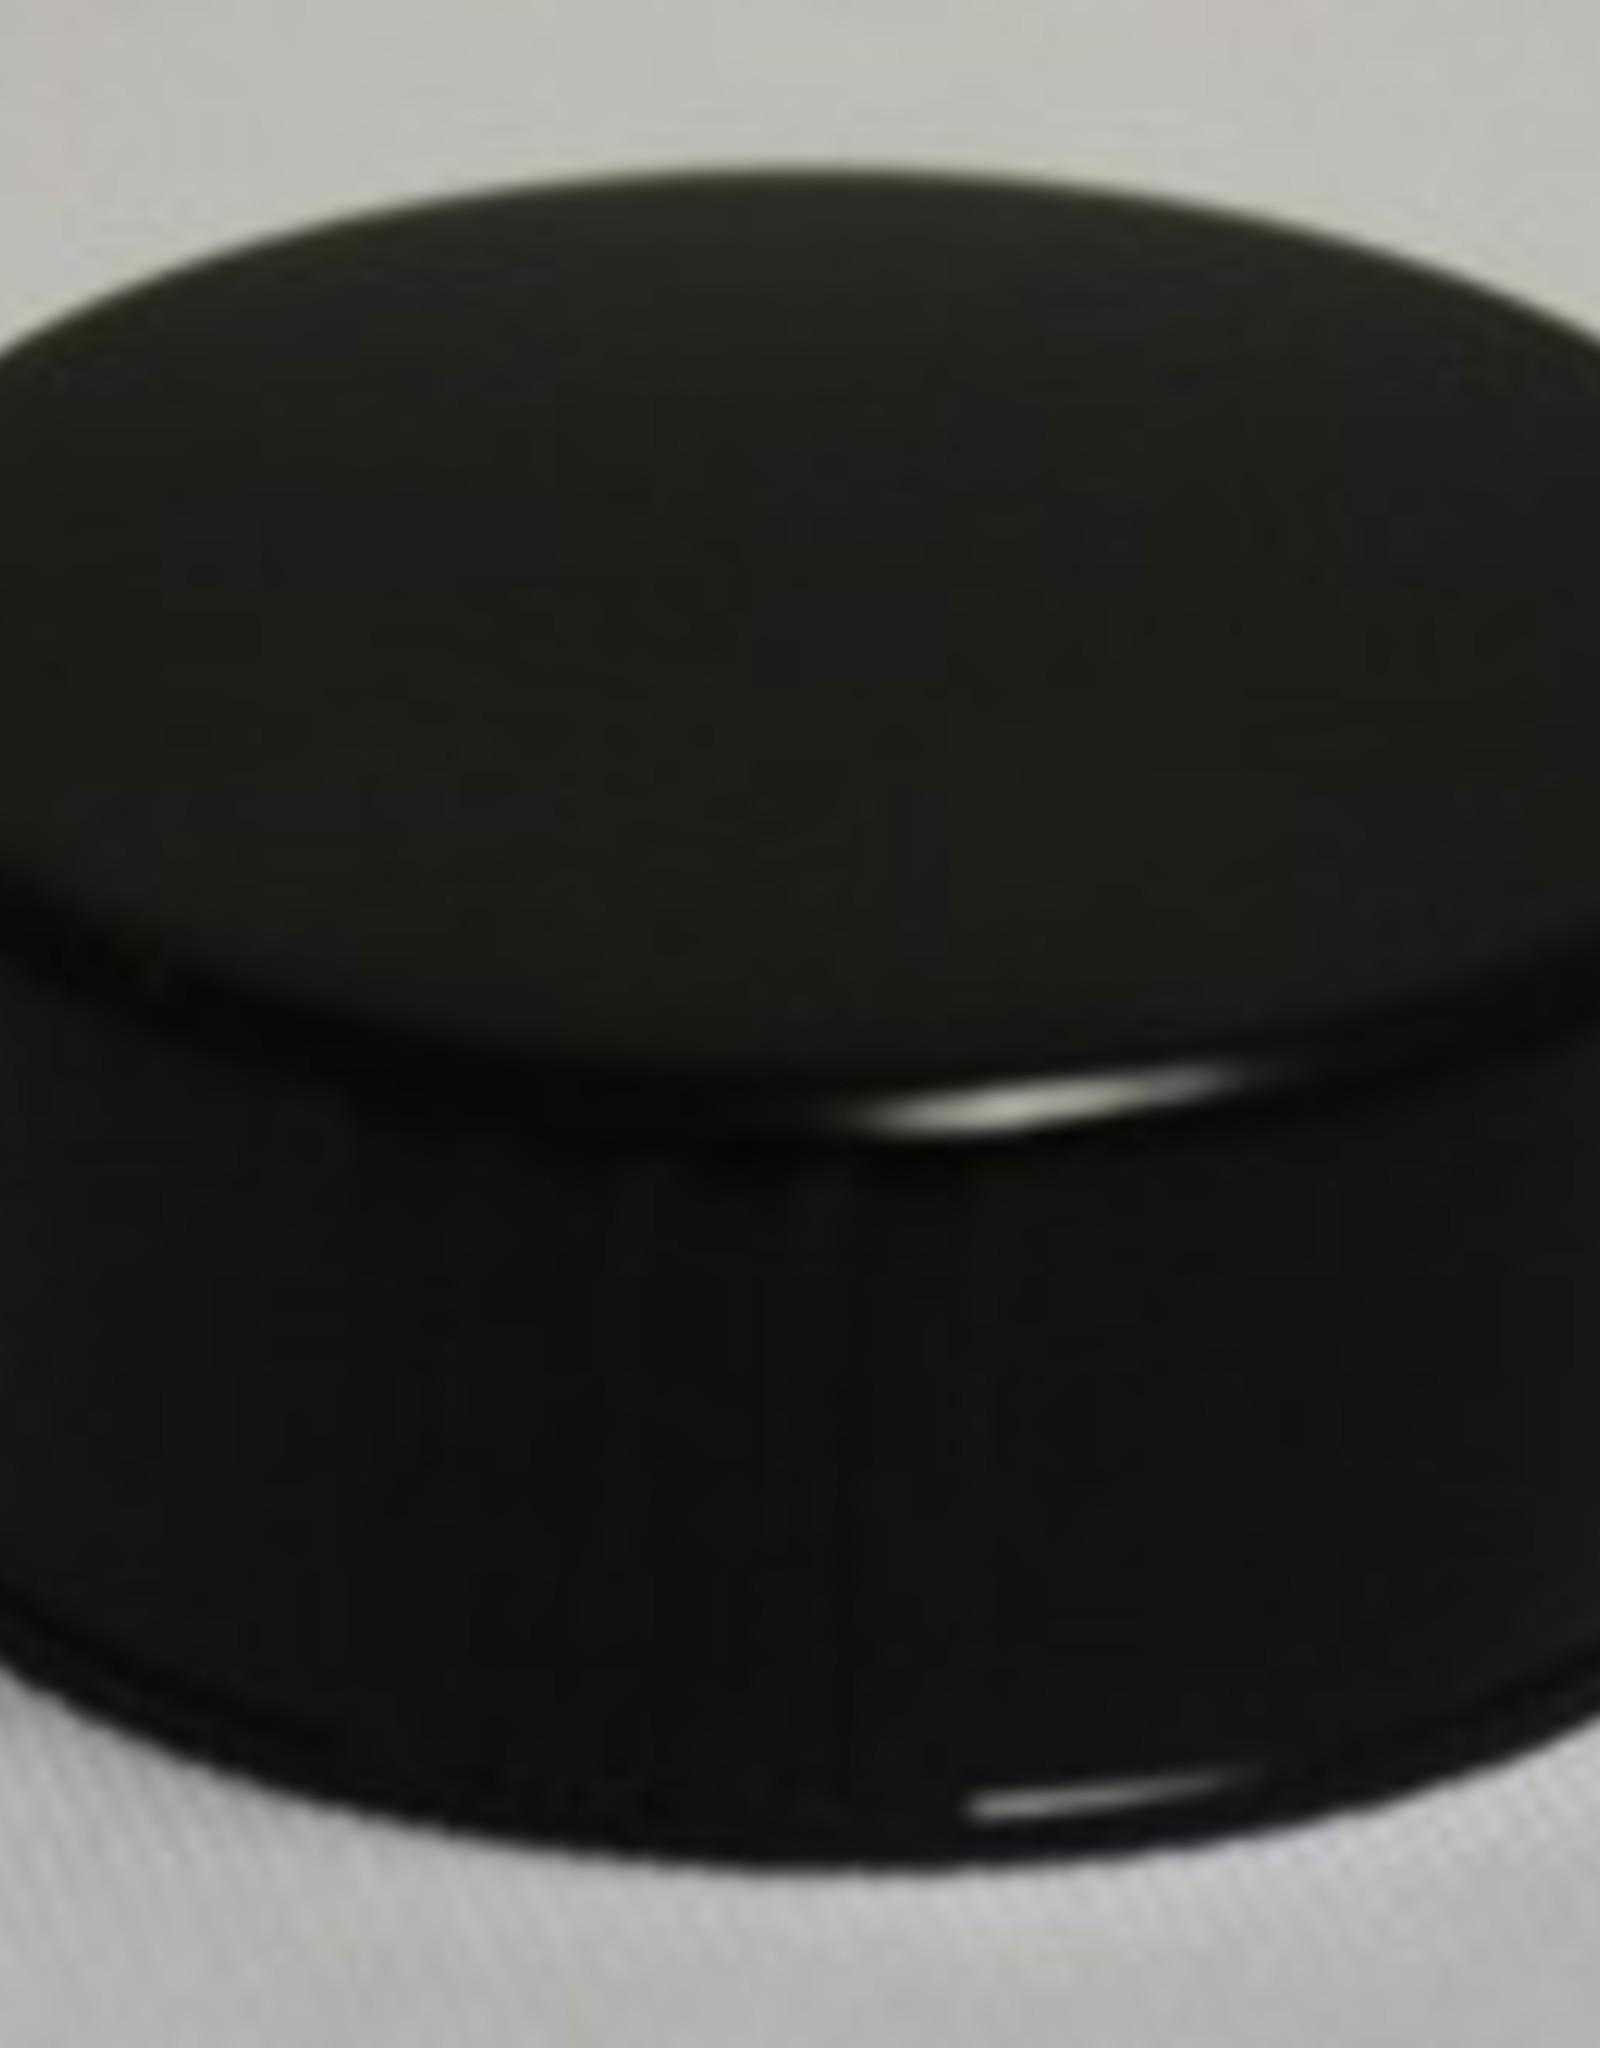 LD CARLSON 28mm POLYSEAL SCREW CAPS